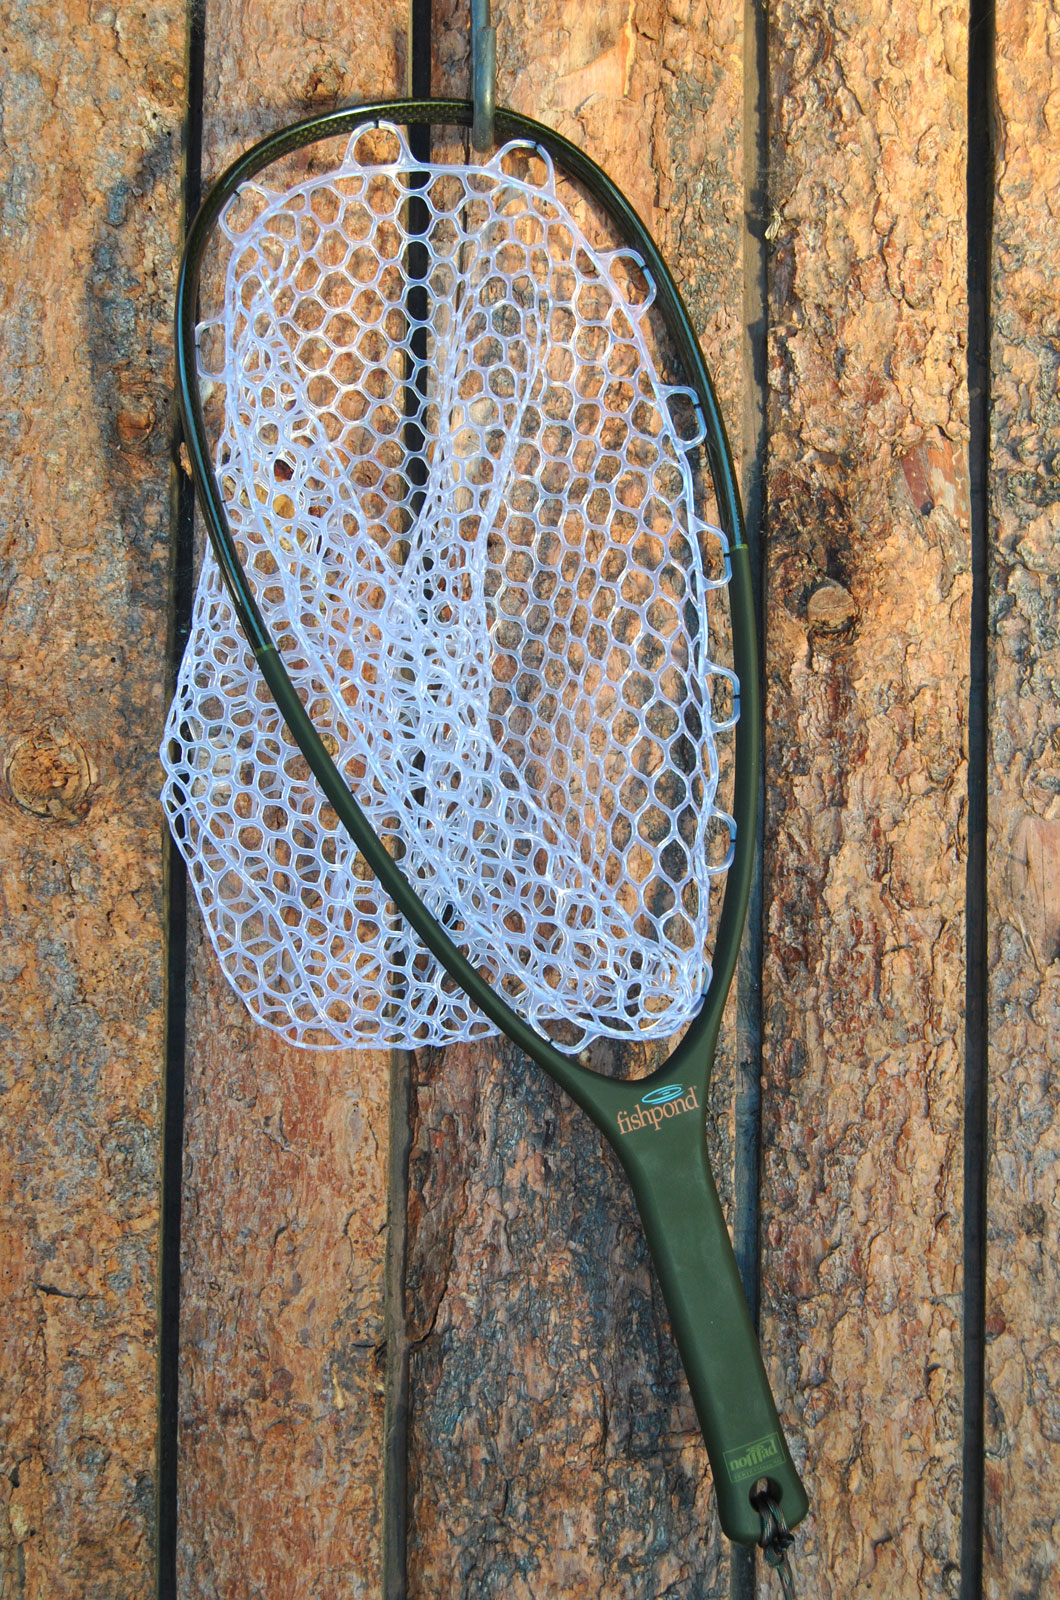 Fishpond nomad native fly fishing landing net carbon fiber for Fishpond fly fishing